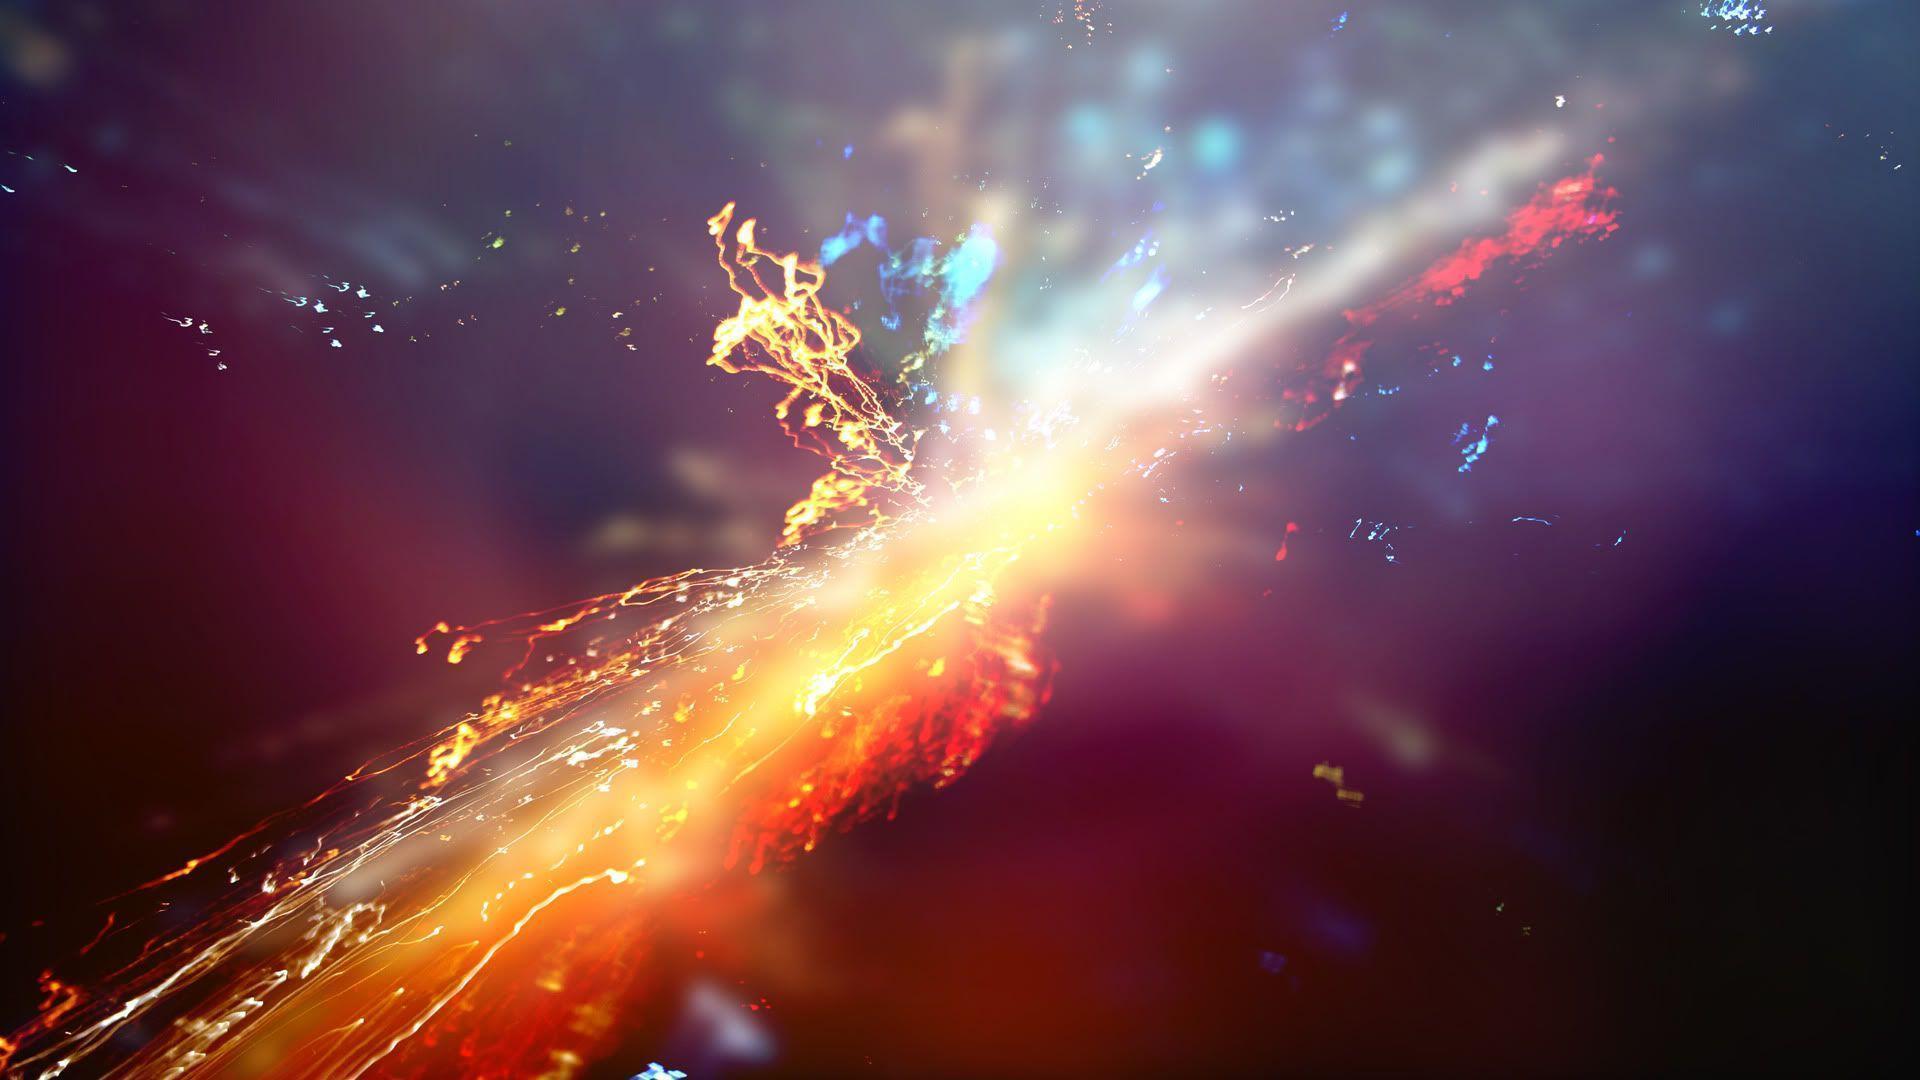 Particle Physics Wallpaper - WallpaperSafari